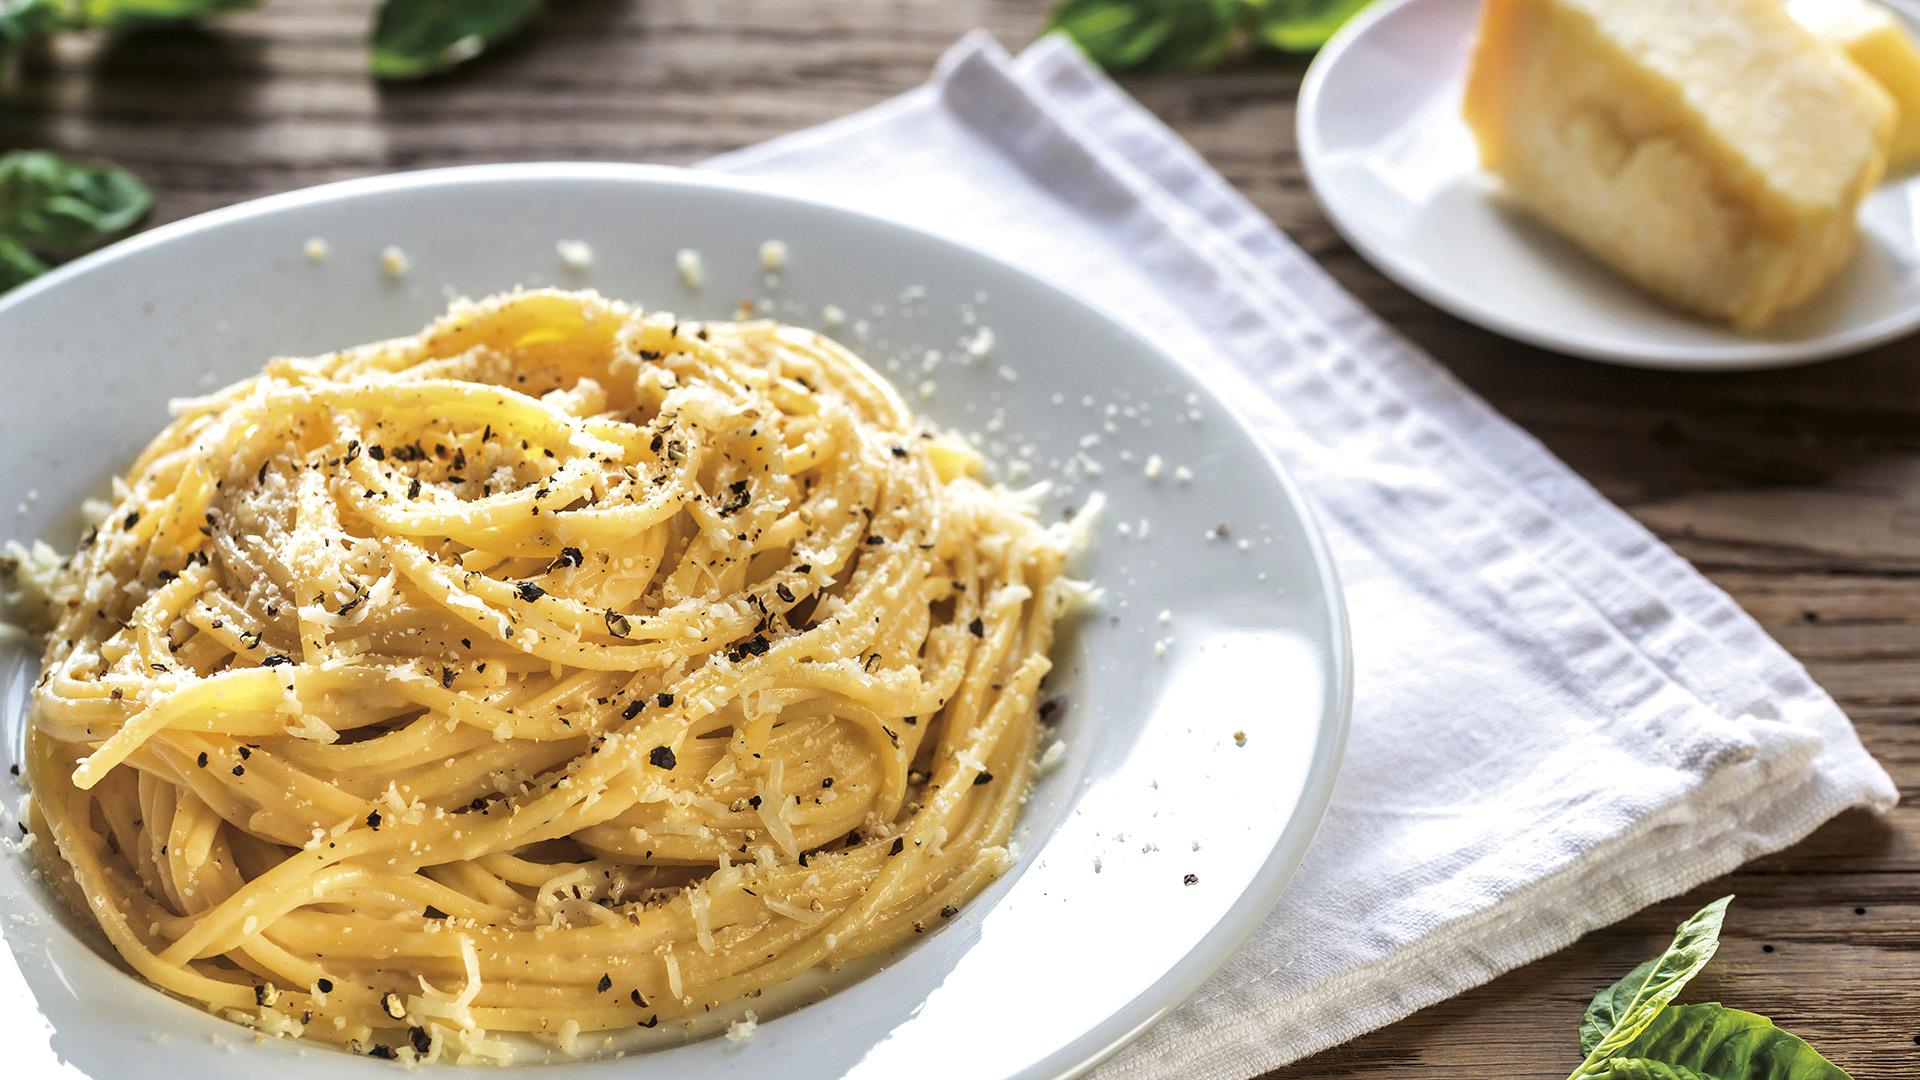 A Simple Yet Delicious Recipe for Cacio e Pepe to Make at Home